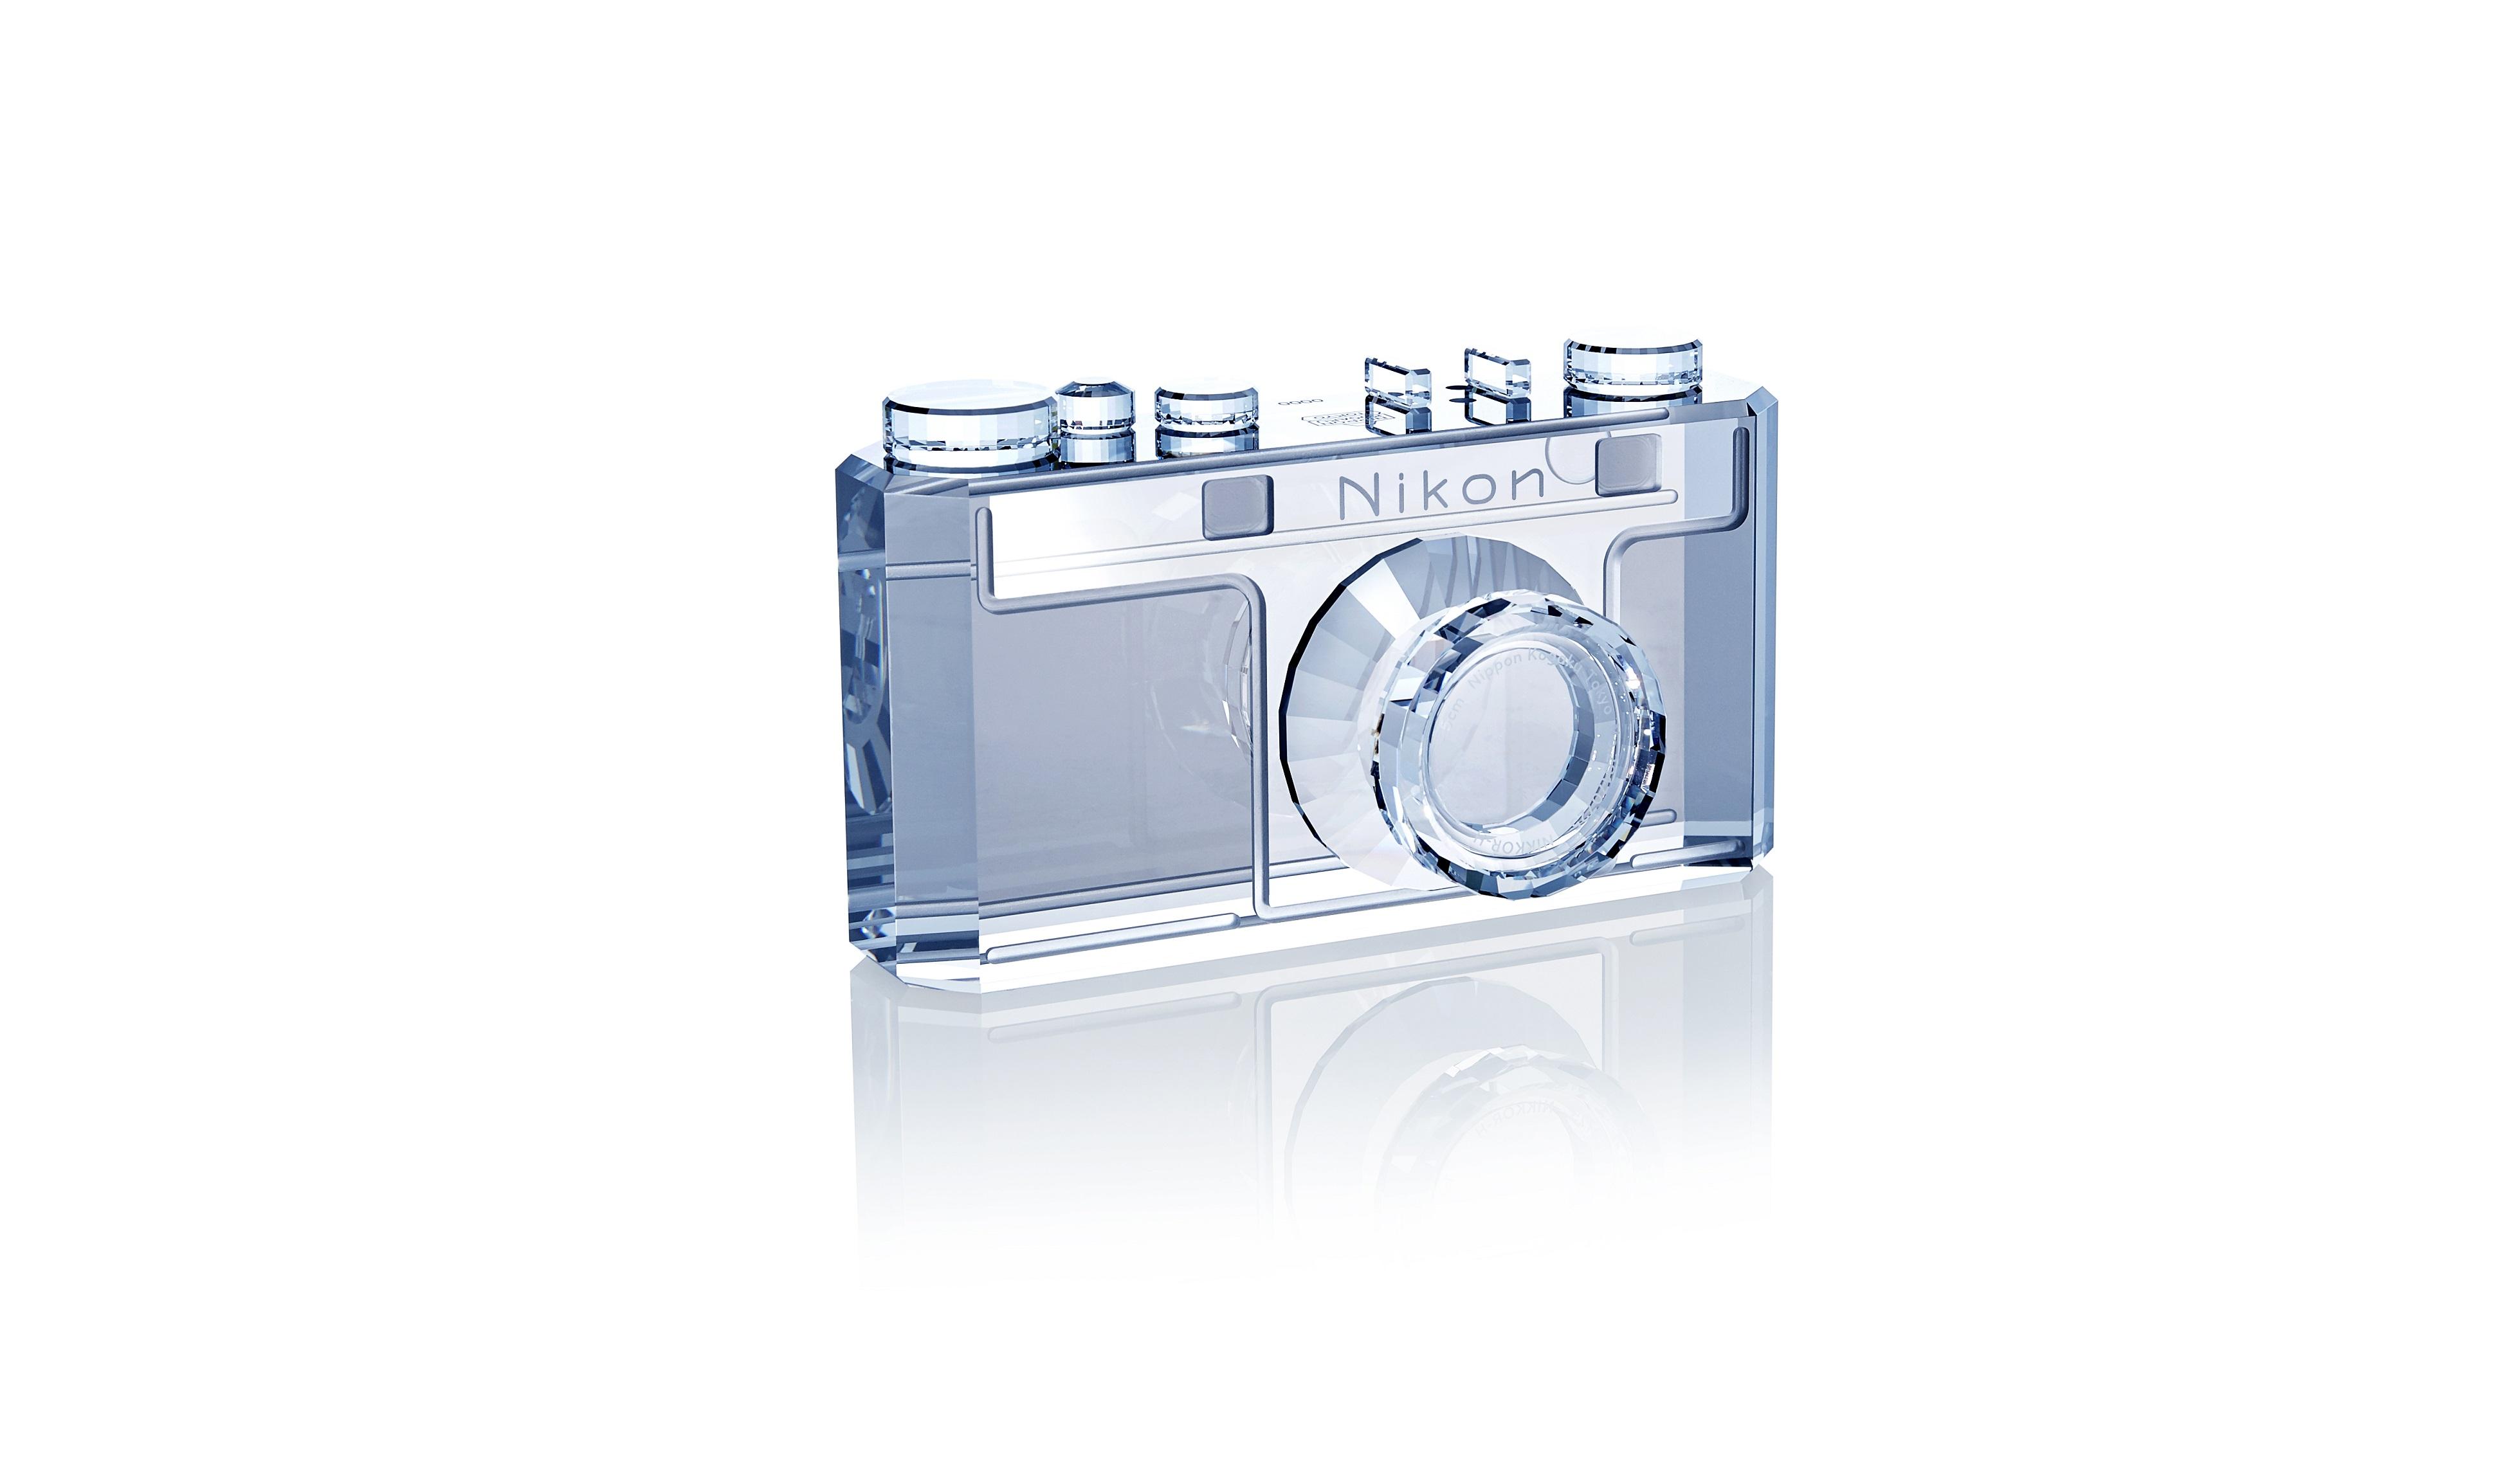 Nikon_100th (8)sml